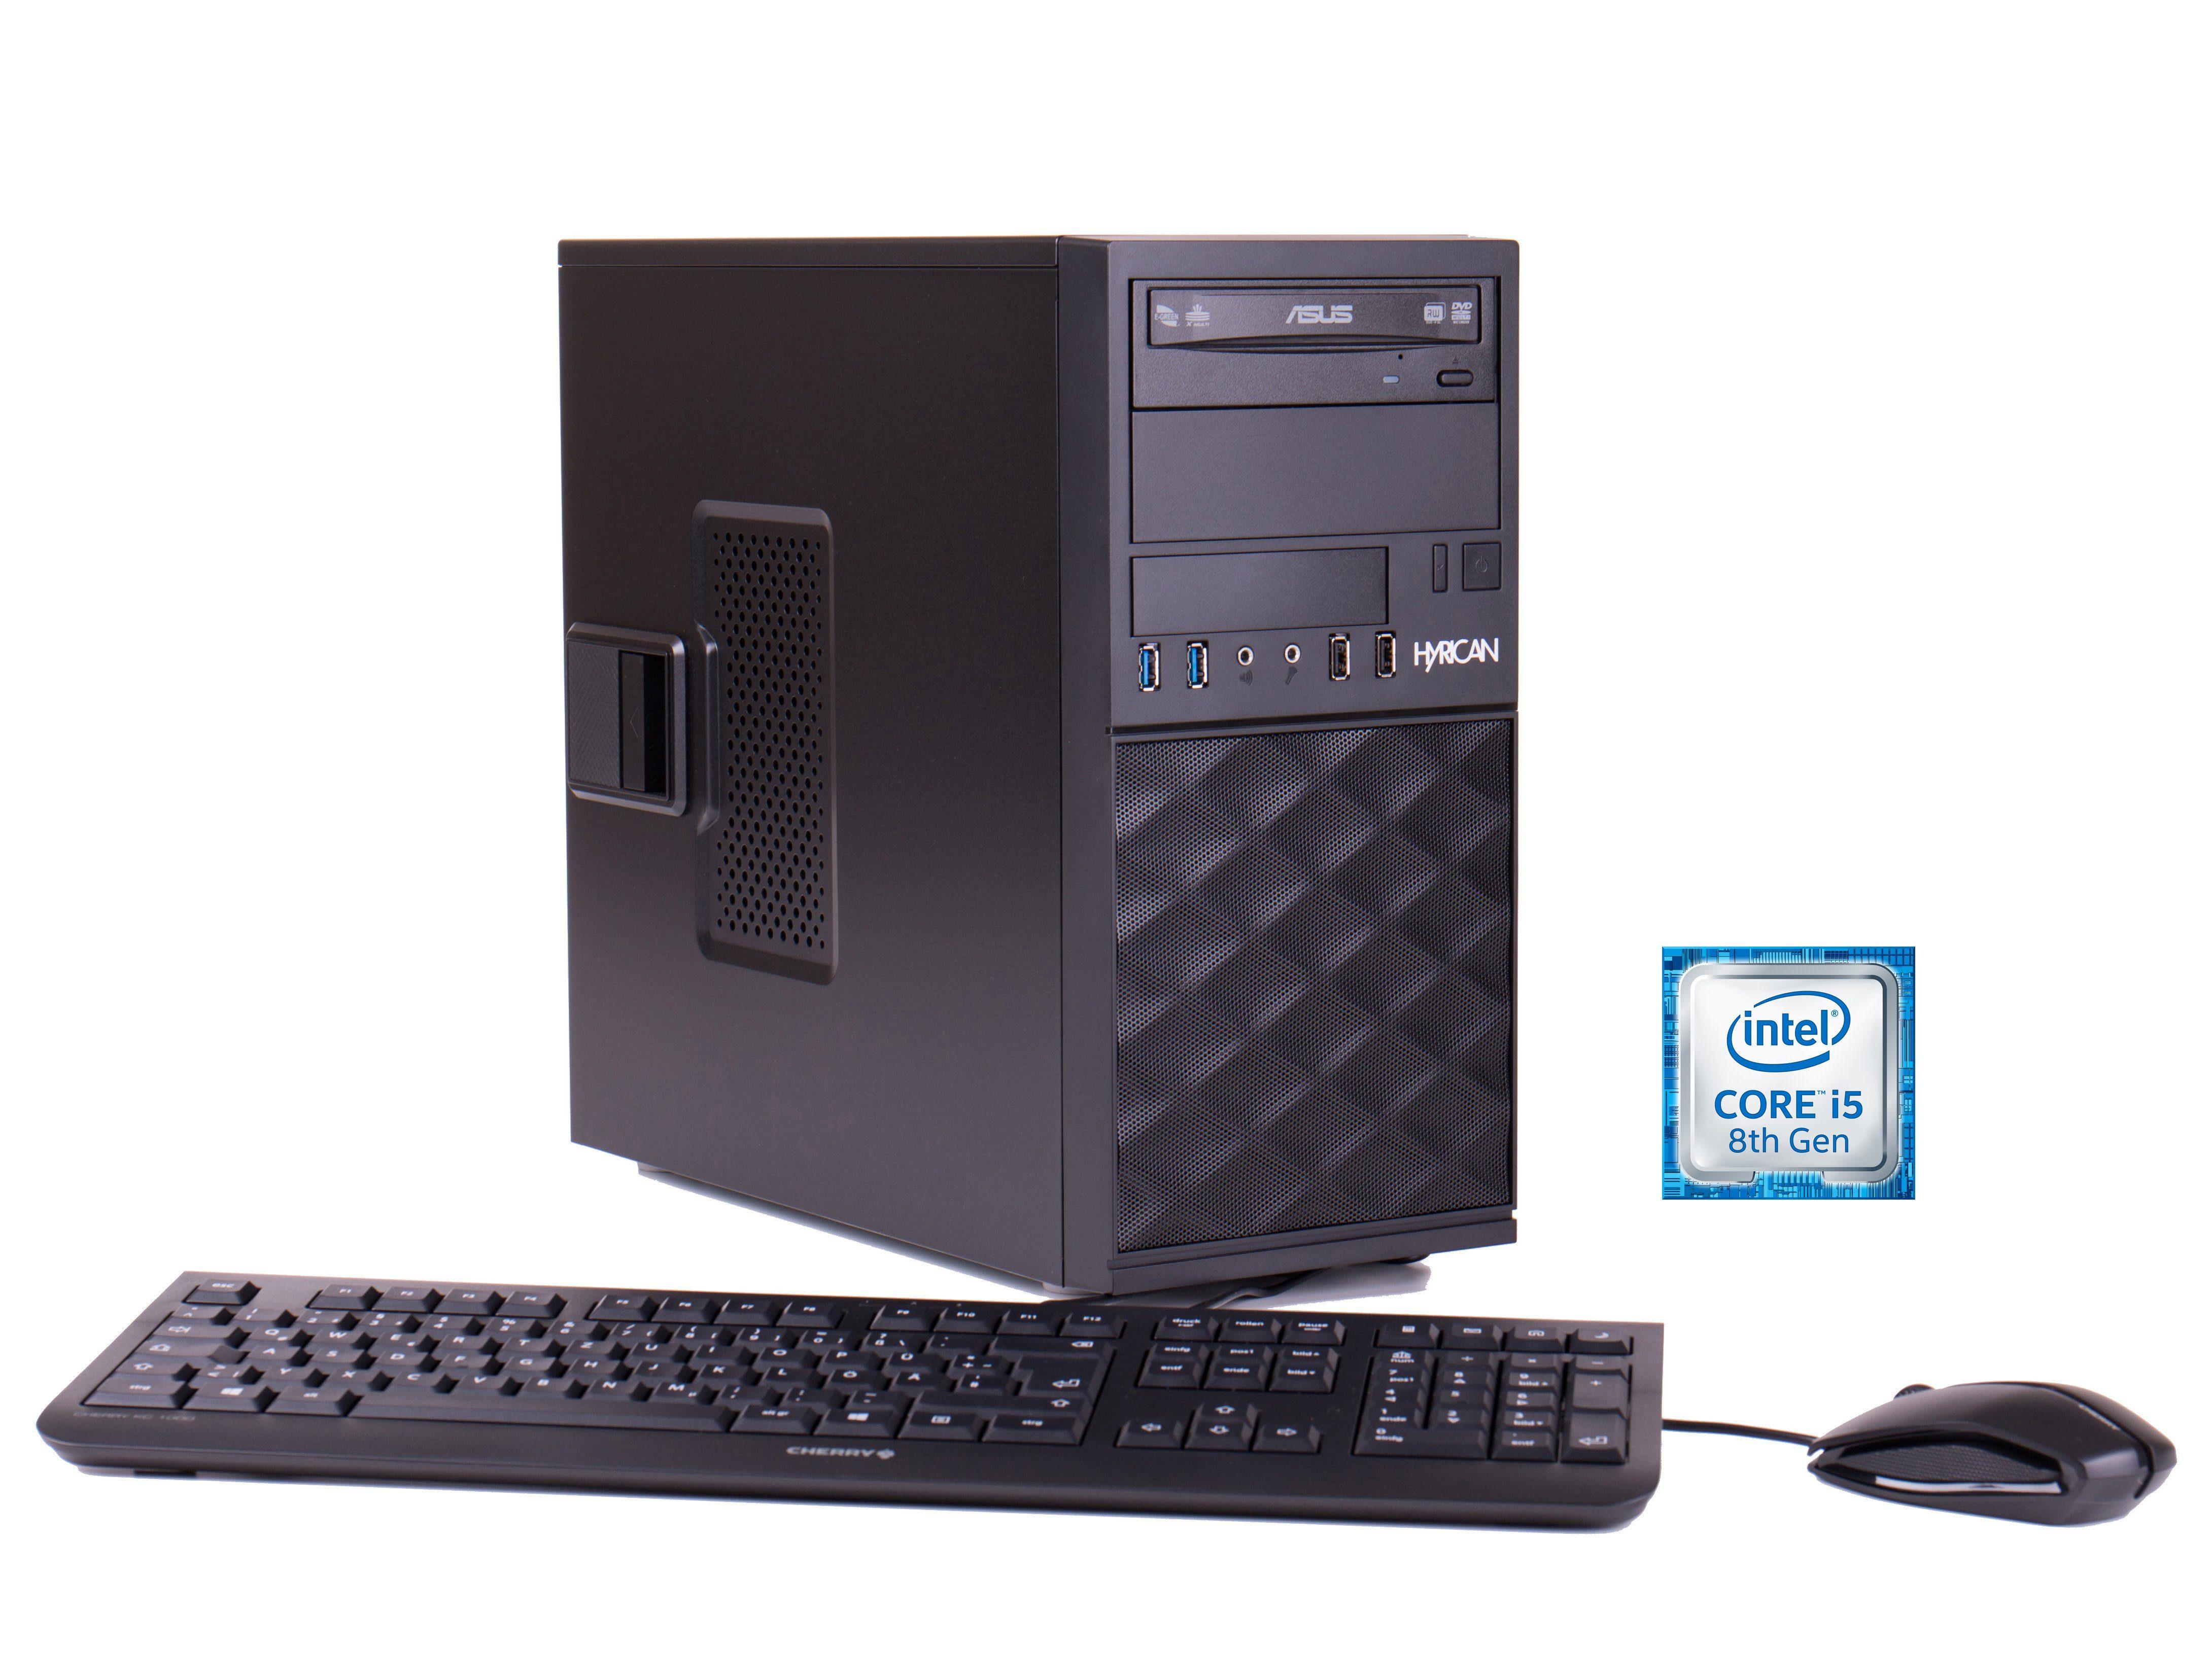 HYRICAN ProBusiness PC i5-8400 16GB 500GB PCIe SSD GTX 1080Ti Win 10 Pro »Workstation CTS00505«